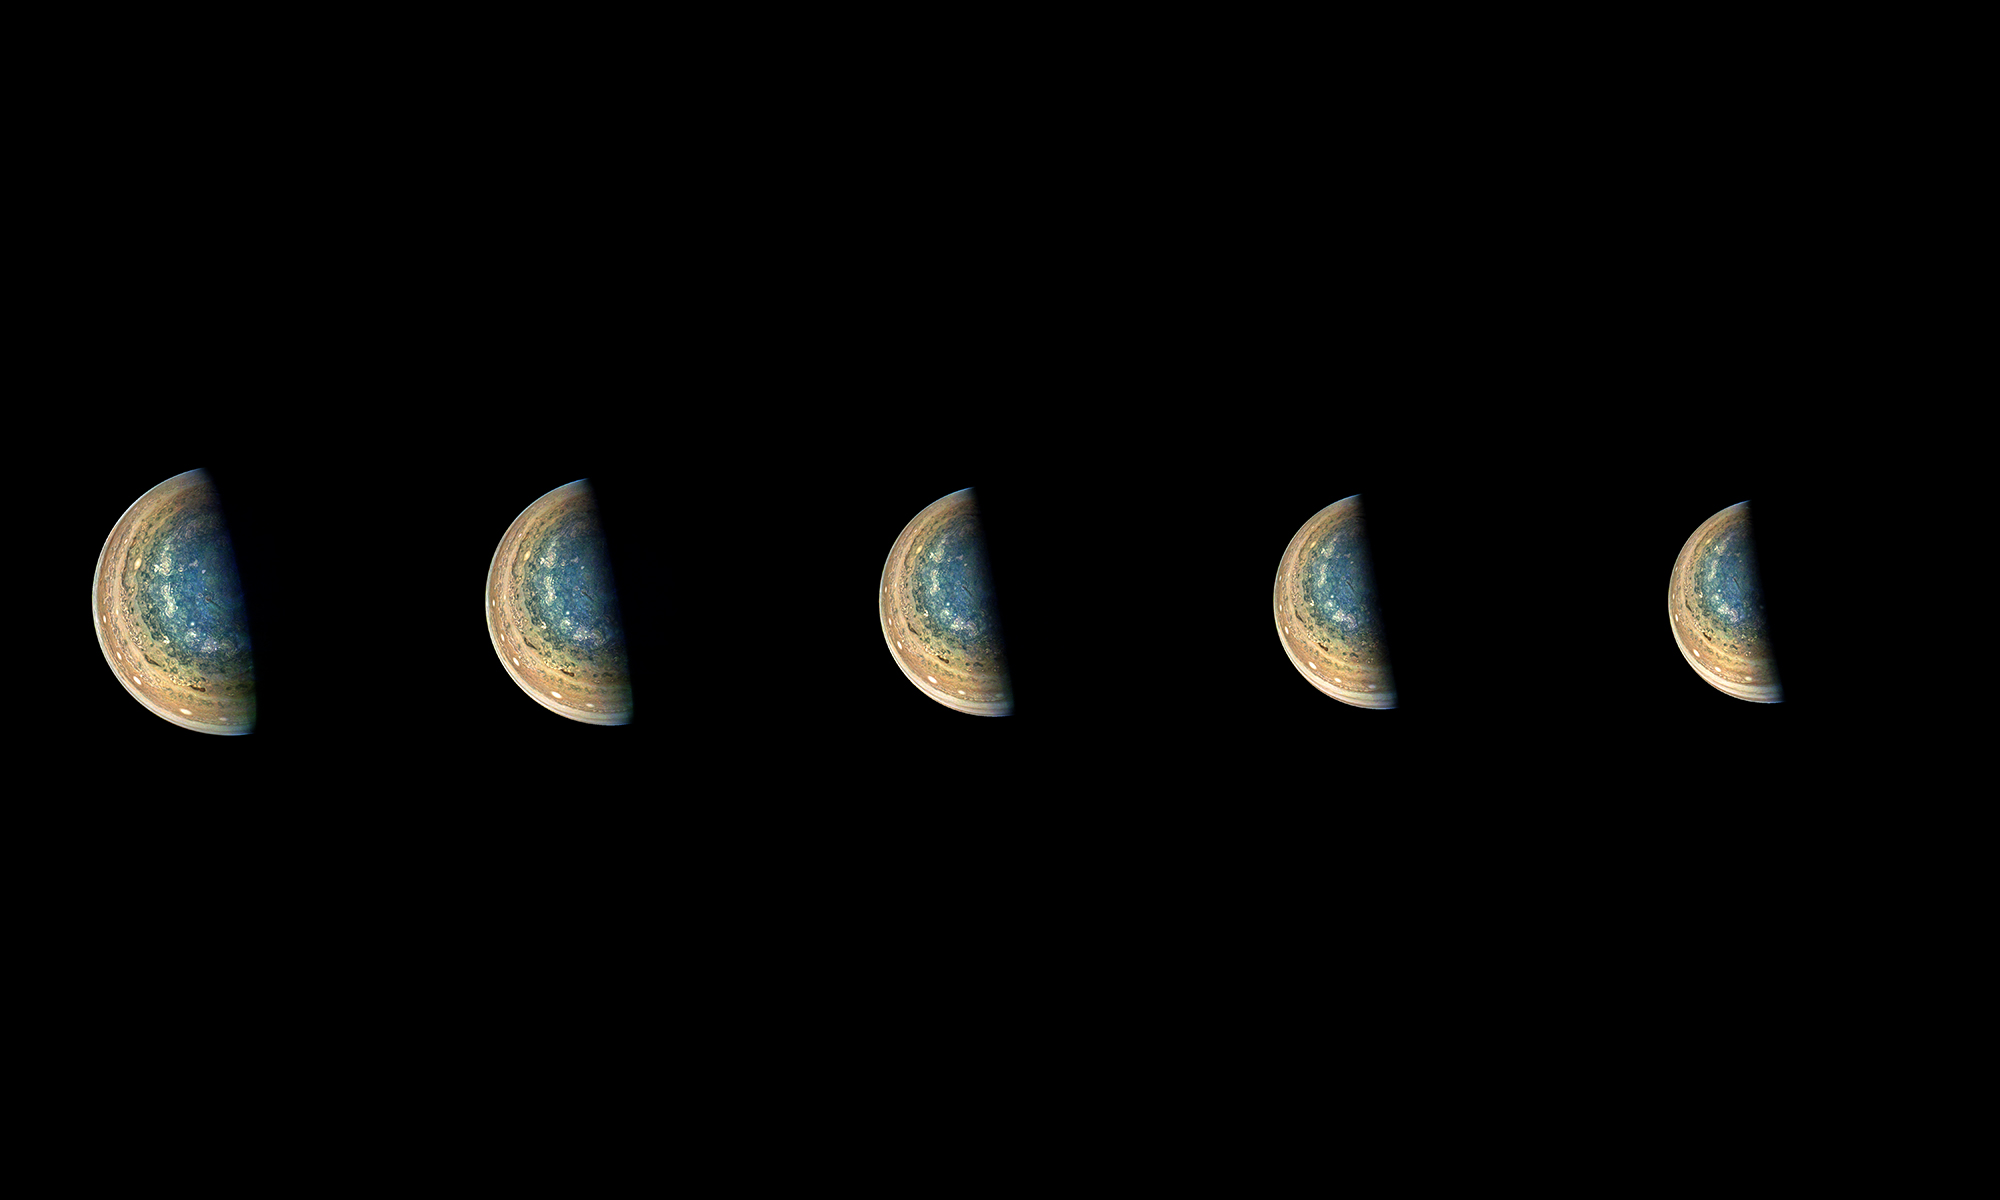 Image credits: NASA/JPL-Caltech/SwRI/MSSS/Gerald Eichstädt